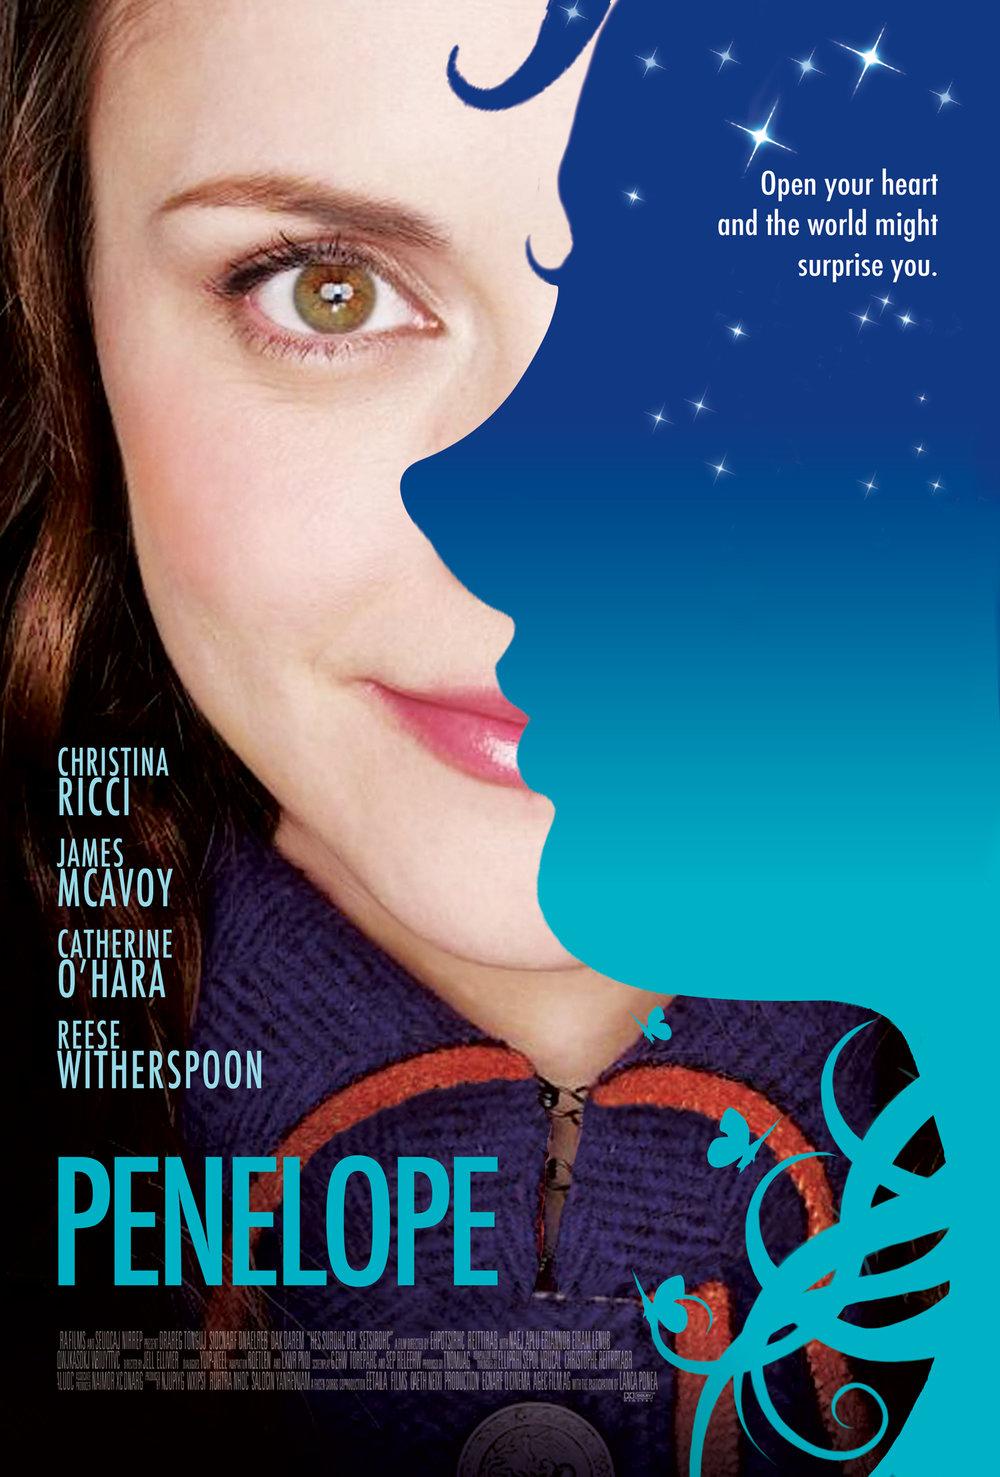 penelope_01.jpg